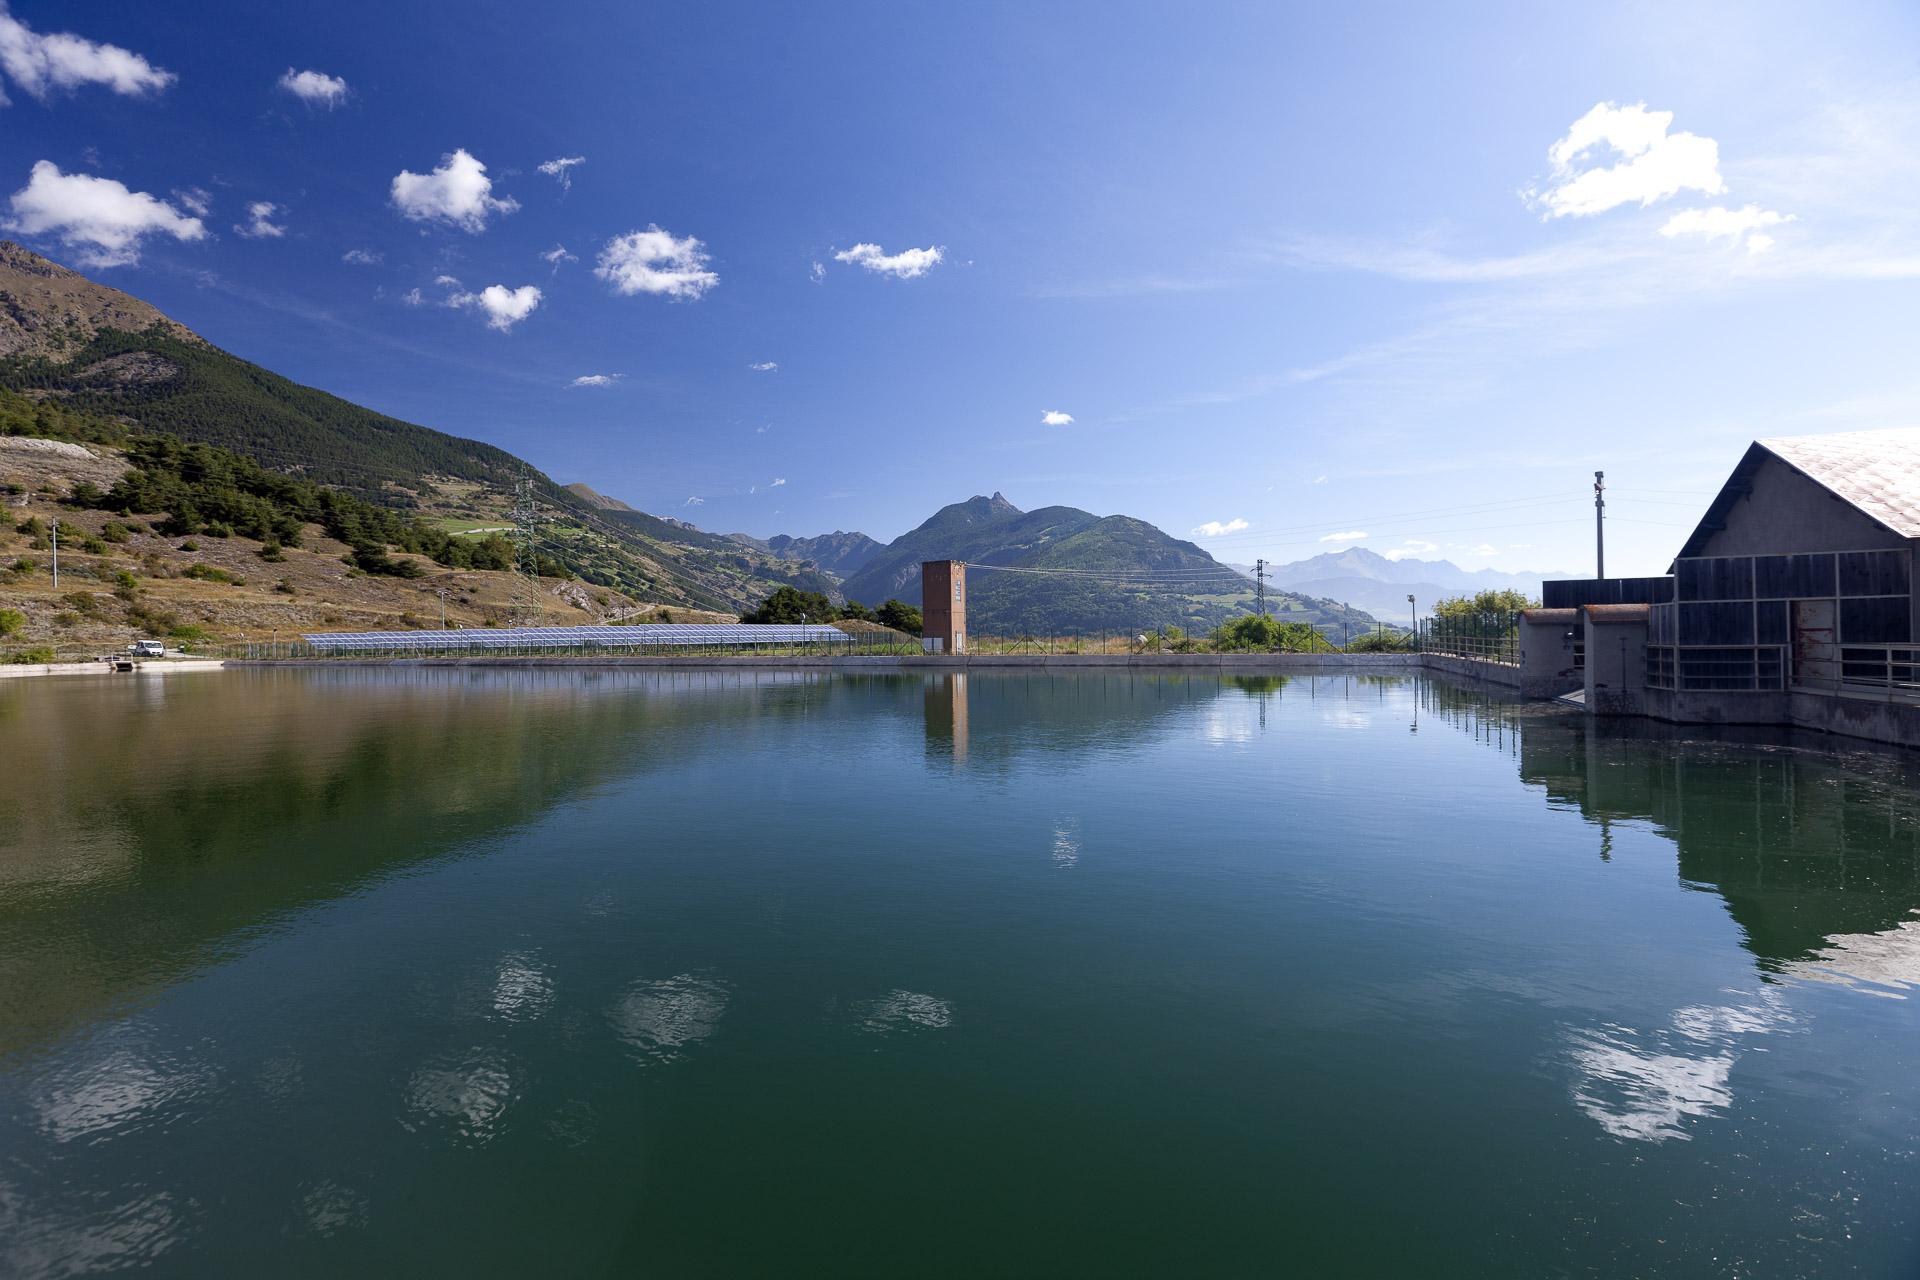 Impianto produzione energie fotovoltaica rinnovabile CVA Quart La tour